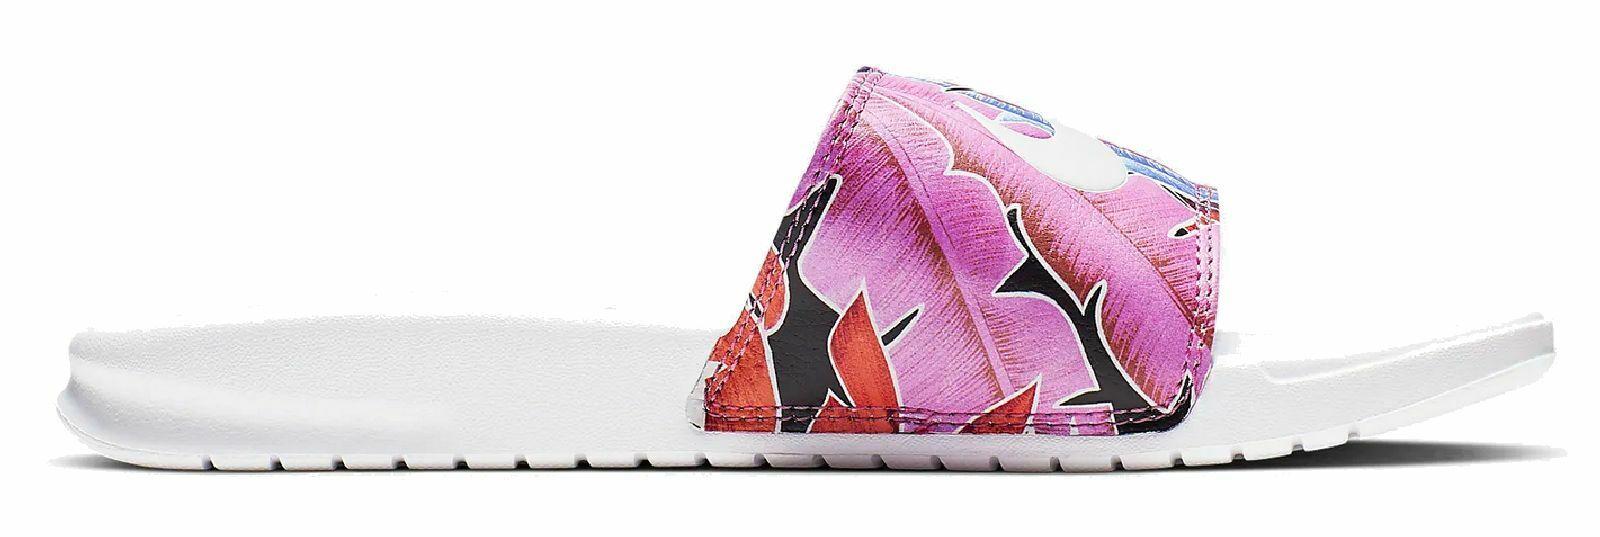 Nike Damen Bade-Schuhe Benassi WMNS BENASSI JDI PRINT weiss Blumen